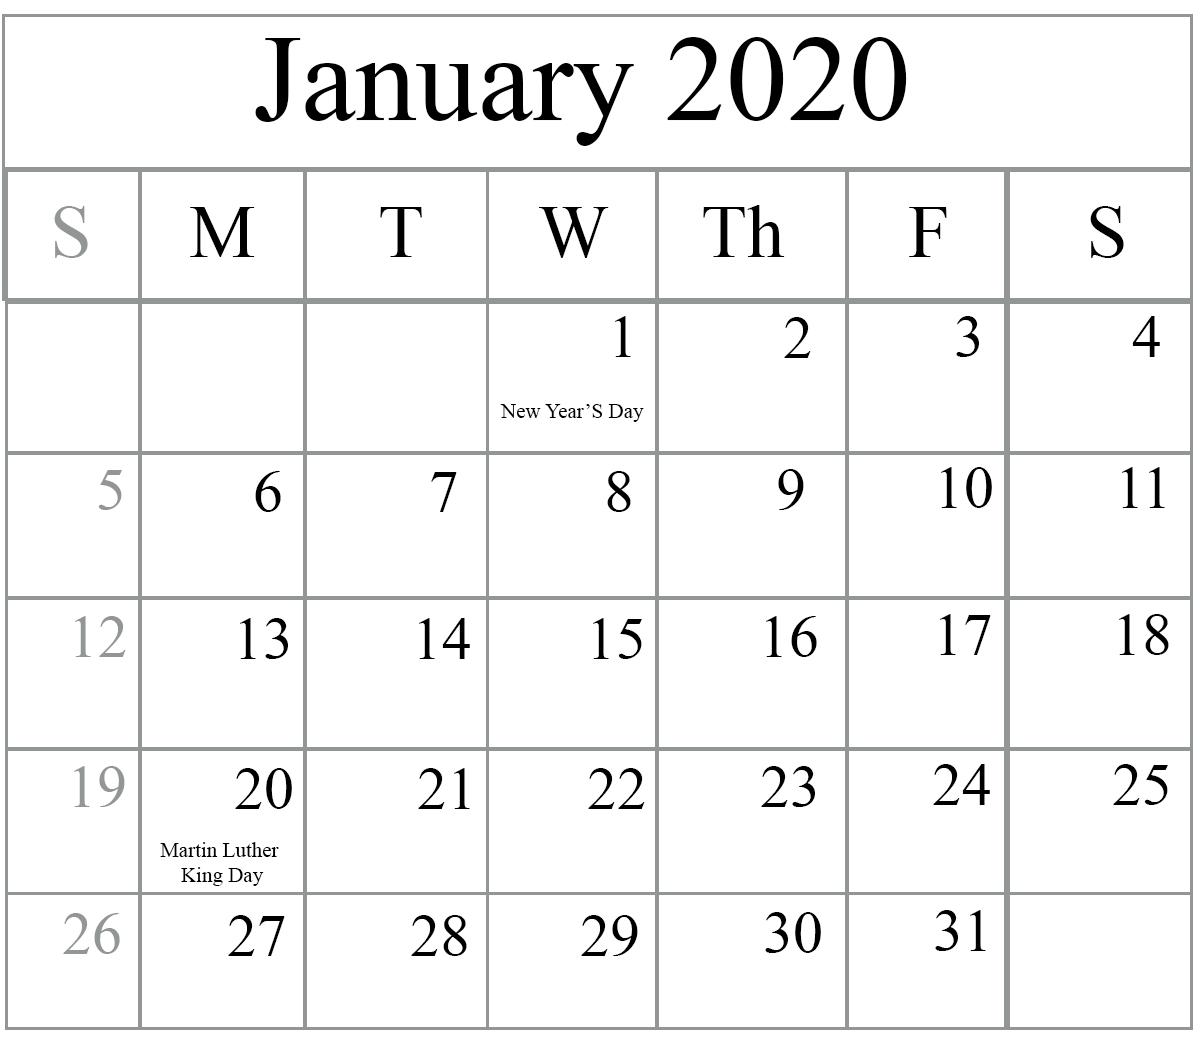 Free January 2020 Calendar Pdf | Printable March Calendar throughout 2020 Calendar Free Printable